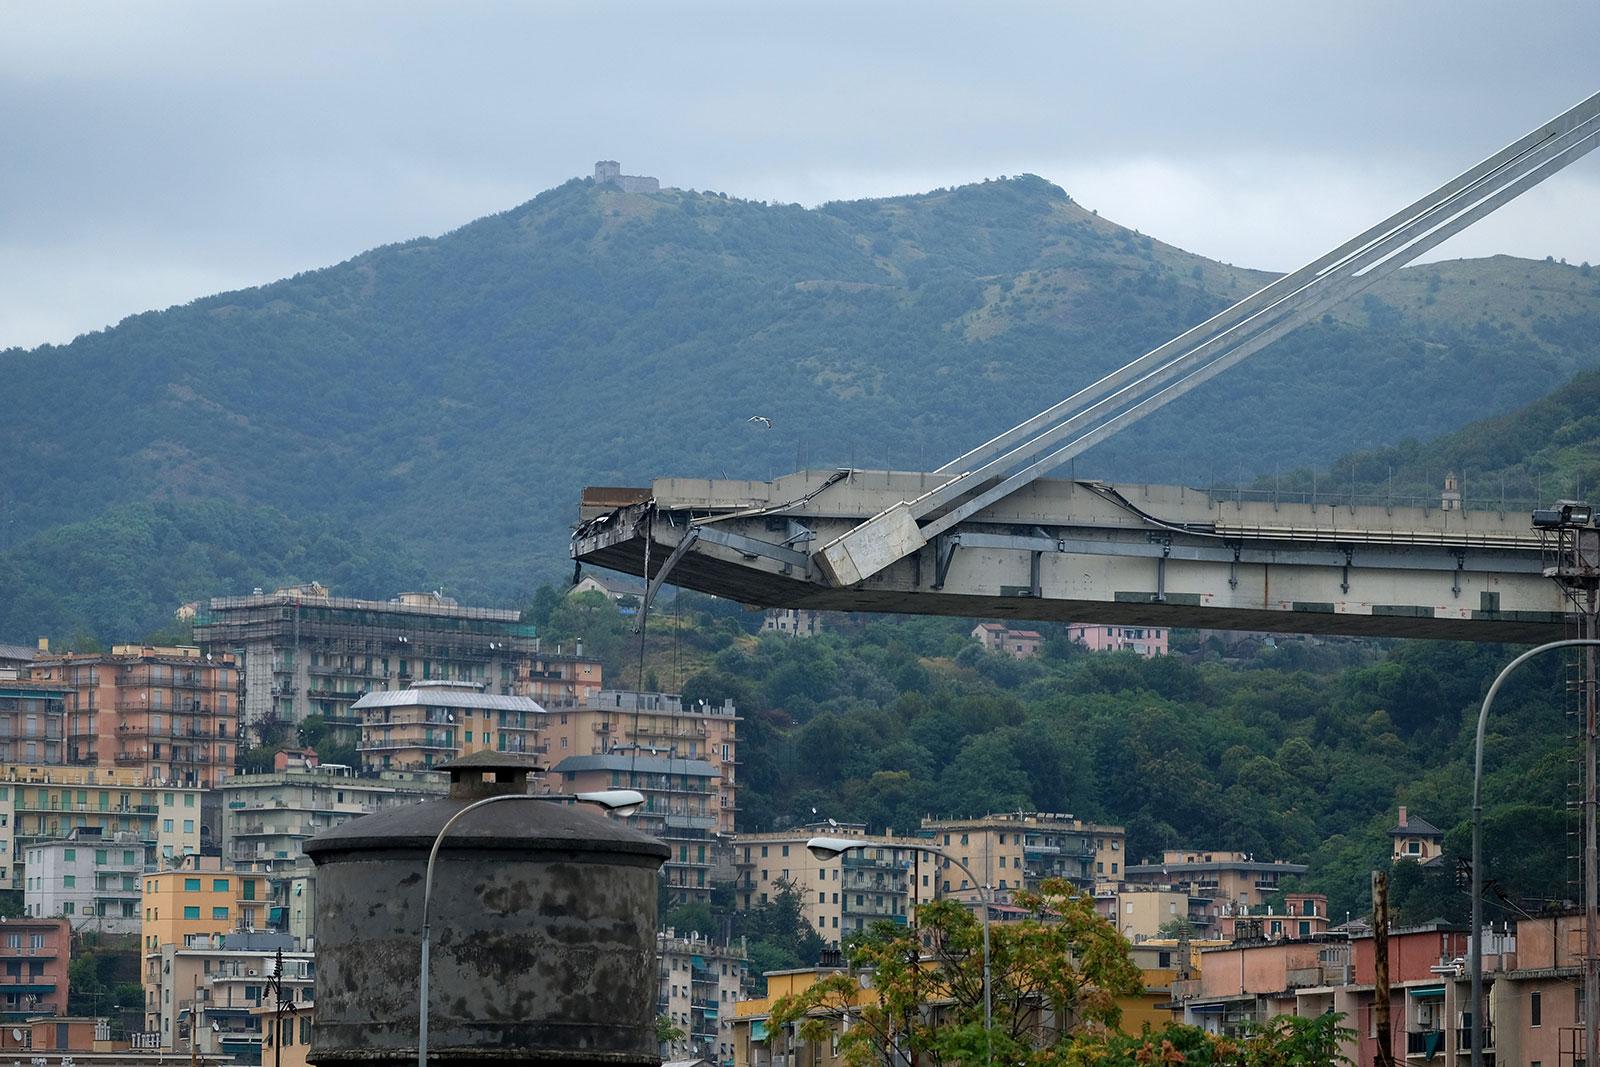 The Ponte Morandi motorway bridge in Genoa on August 14, 2018. (ANDREA LEONI/AFP/Getty Images)